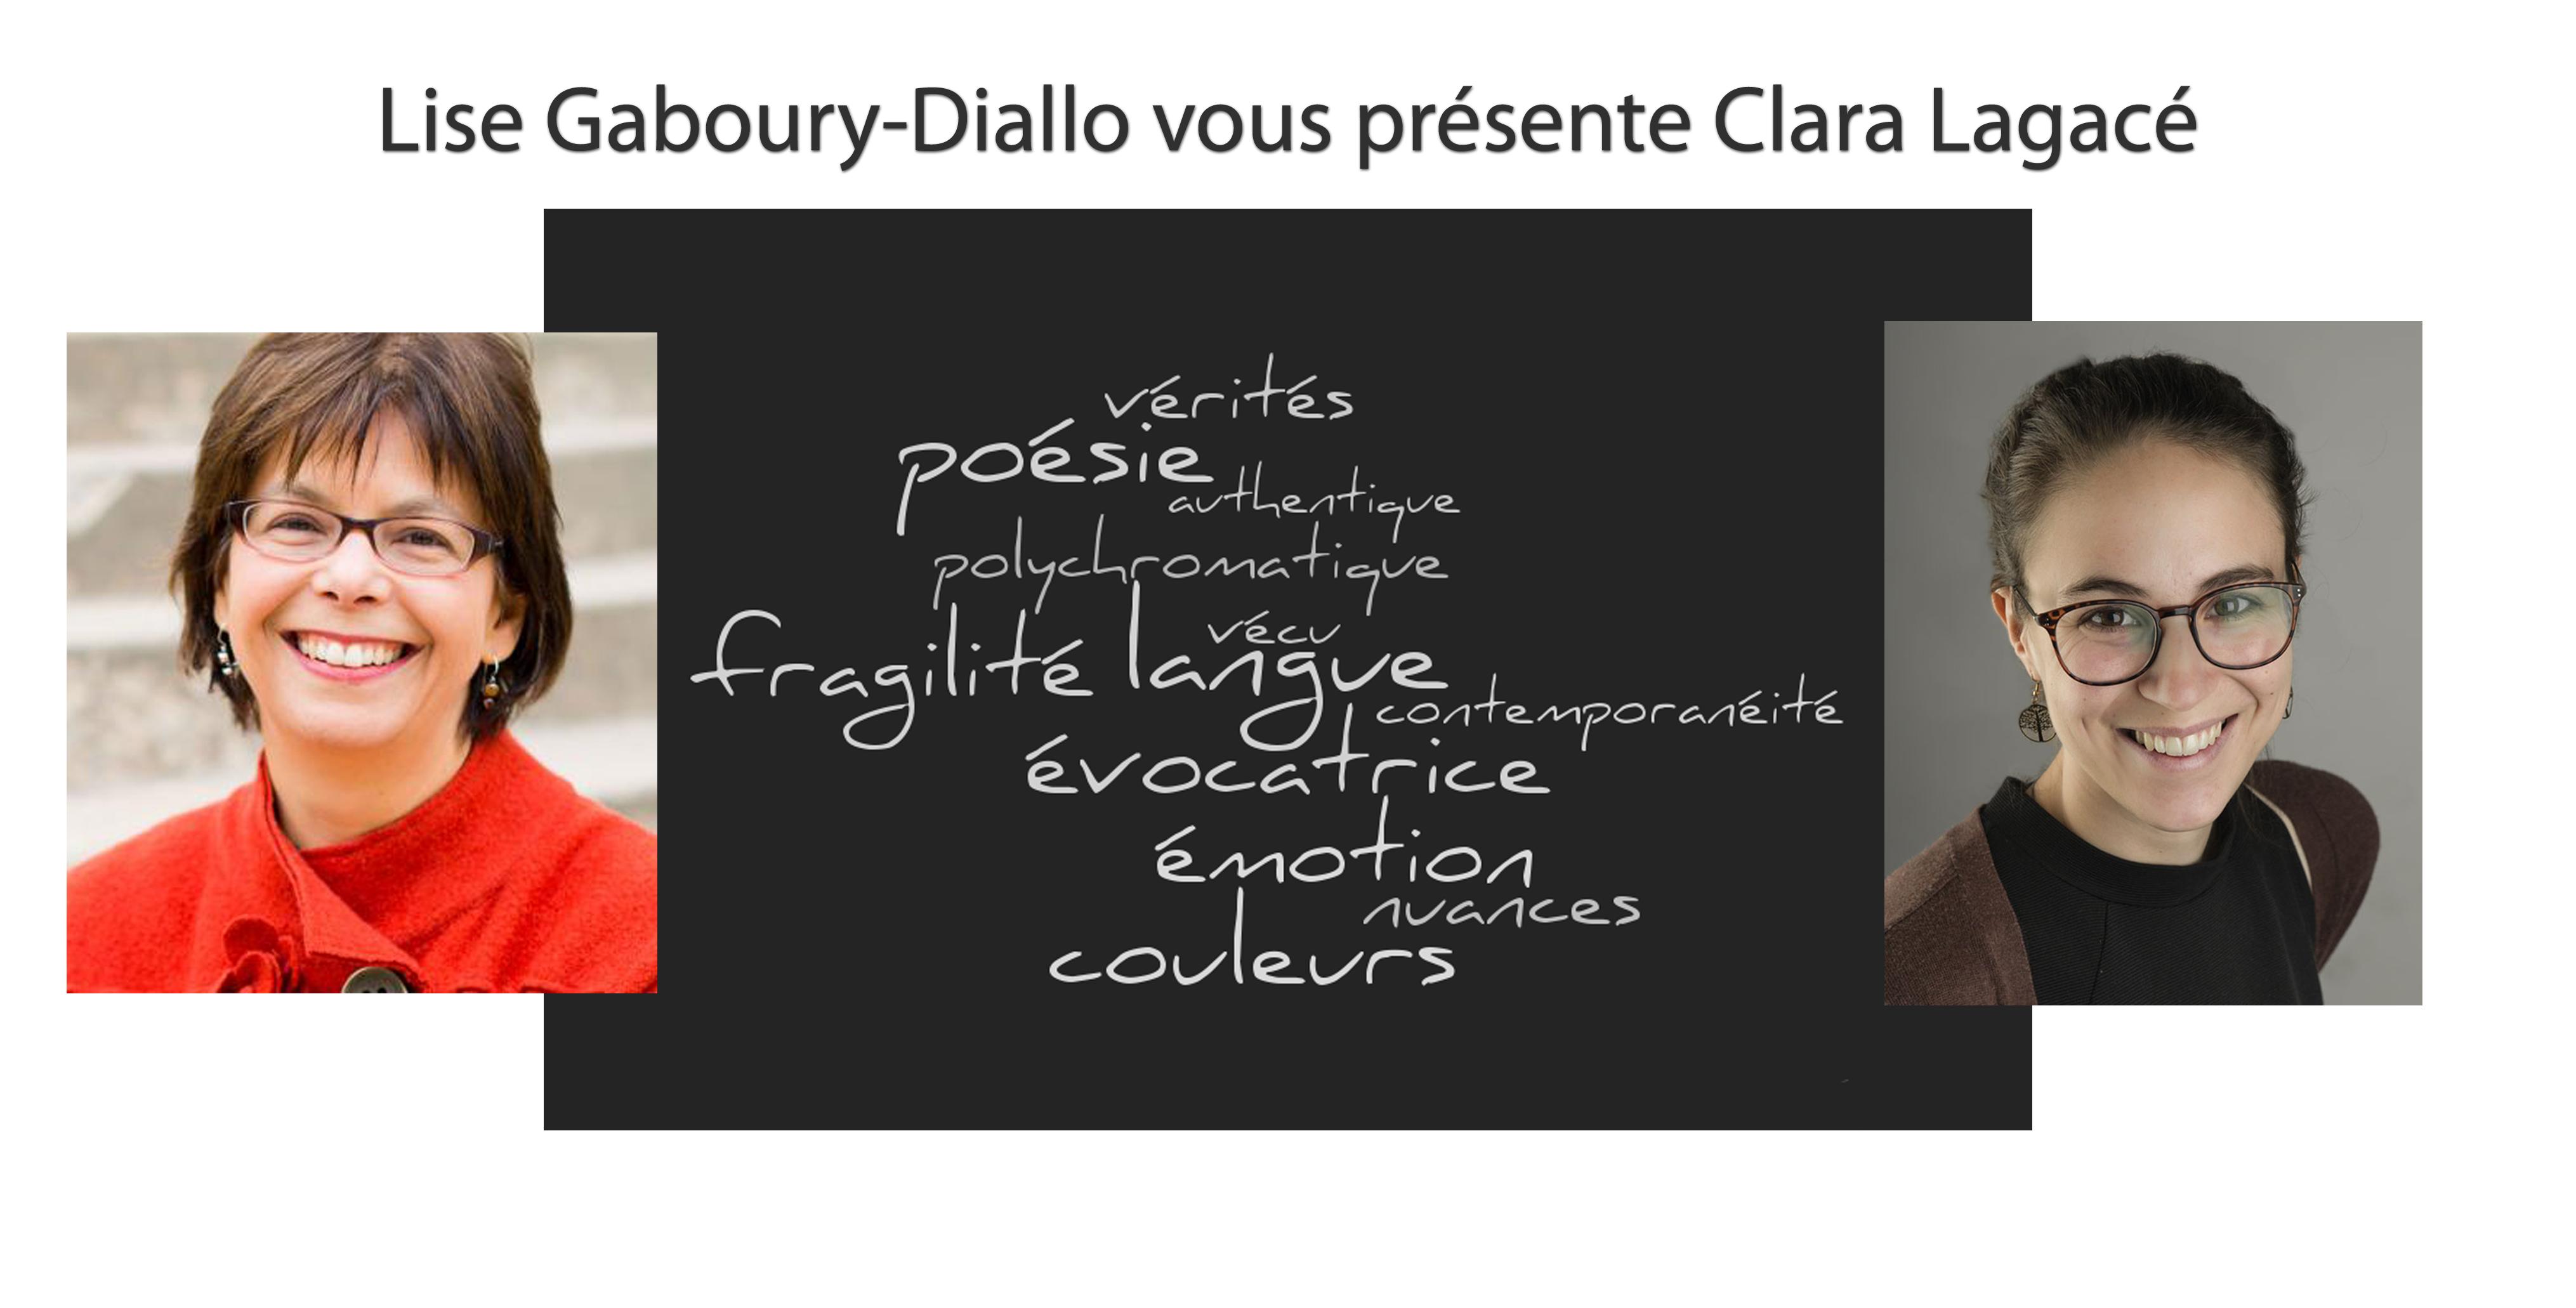 Lise Gaboury-Diallo vous présente Clara Lagacé